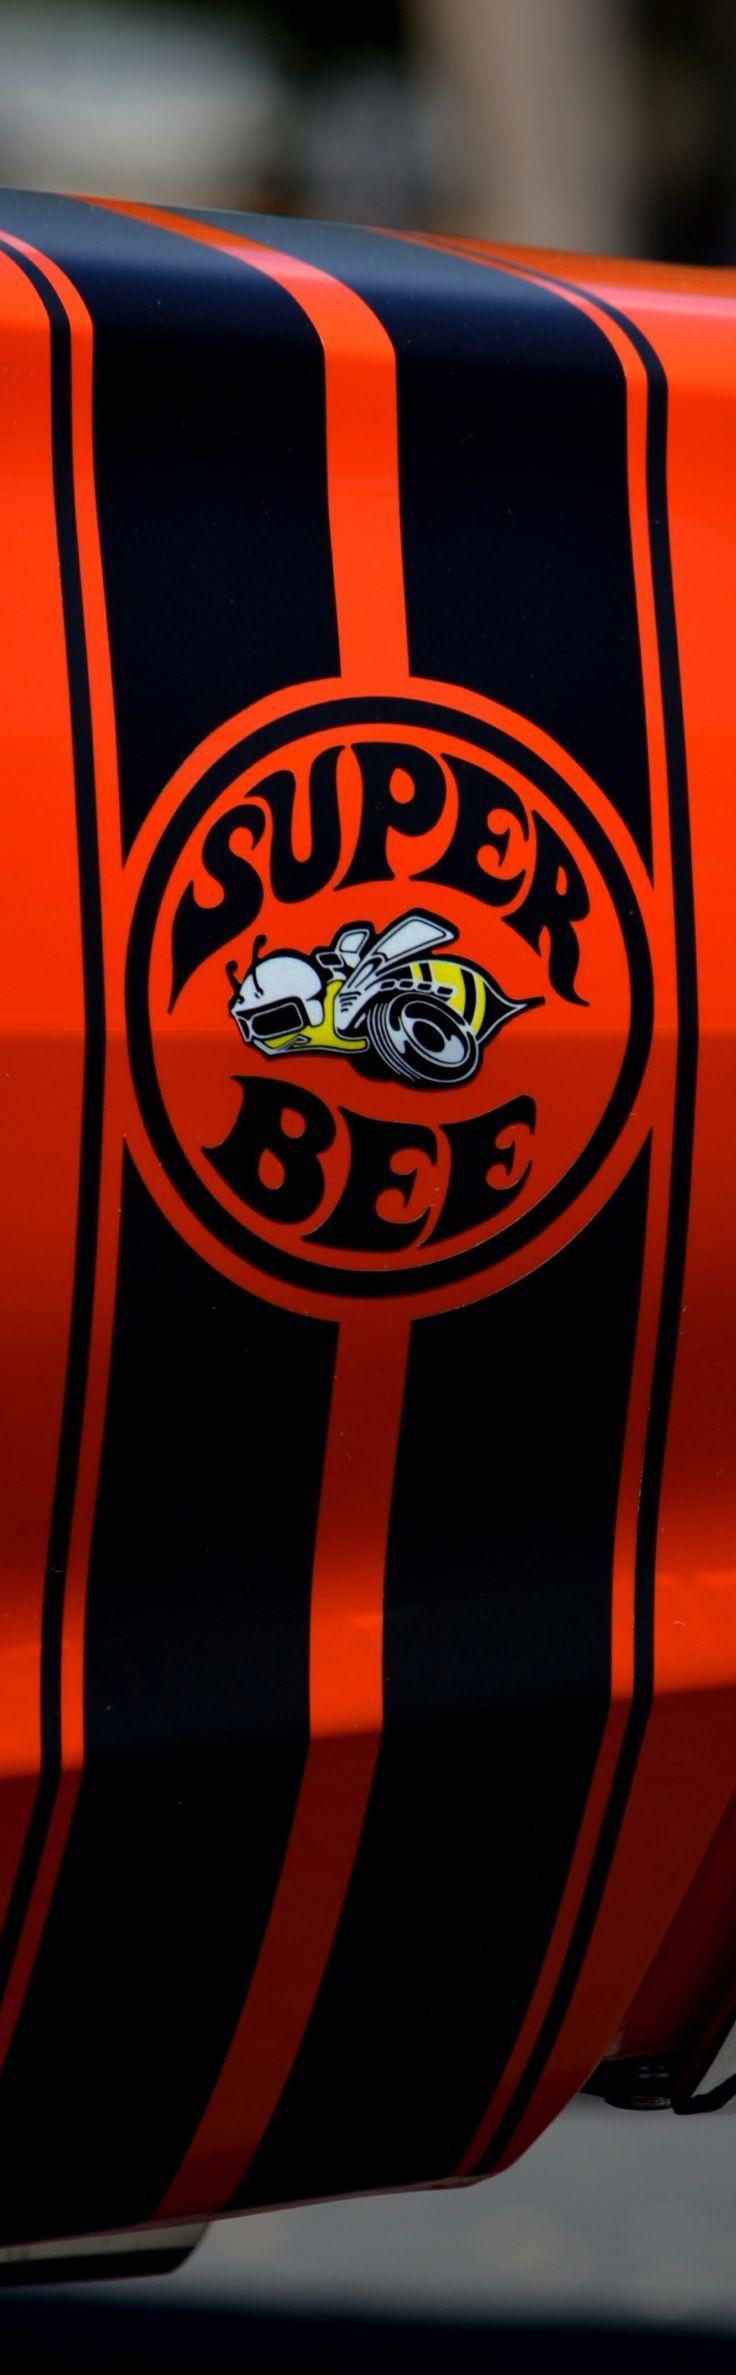 Visit The MACHINE Shop Café... ❤ Best of Dodge @ MACHINE ❤ (1971 Dodge Charger Super Bee)